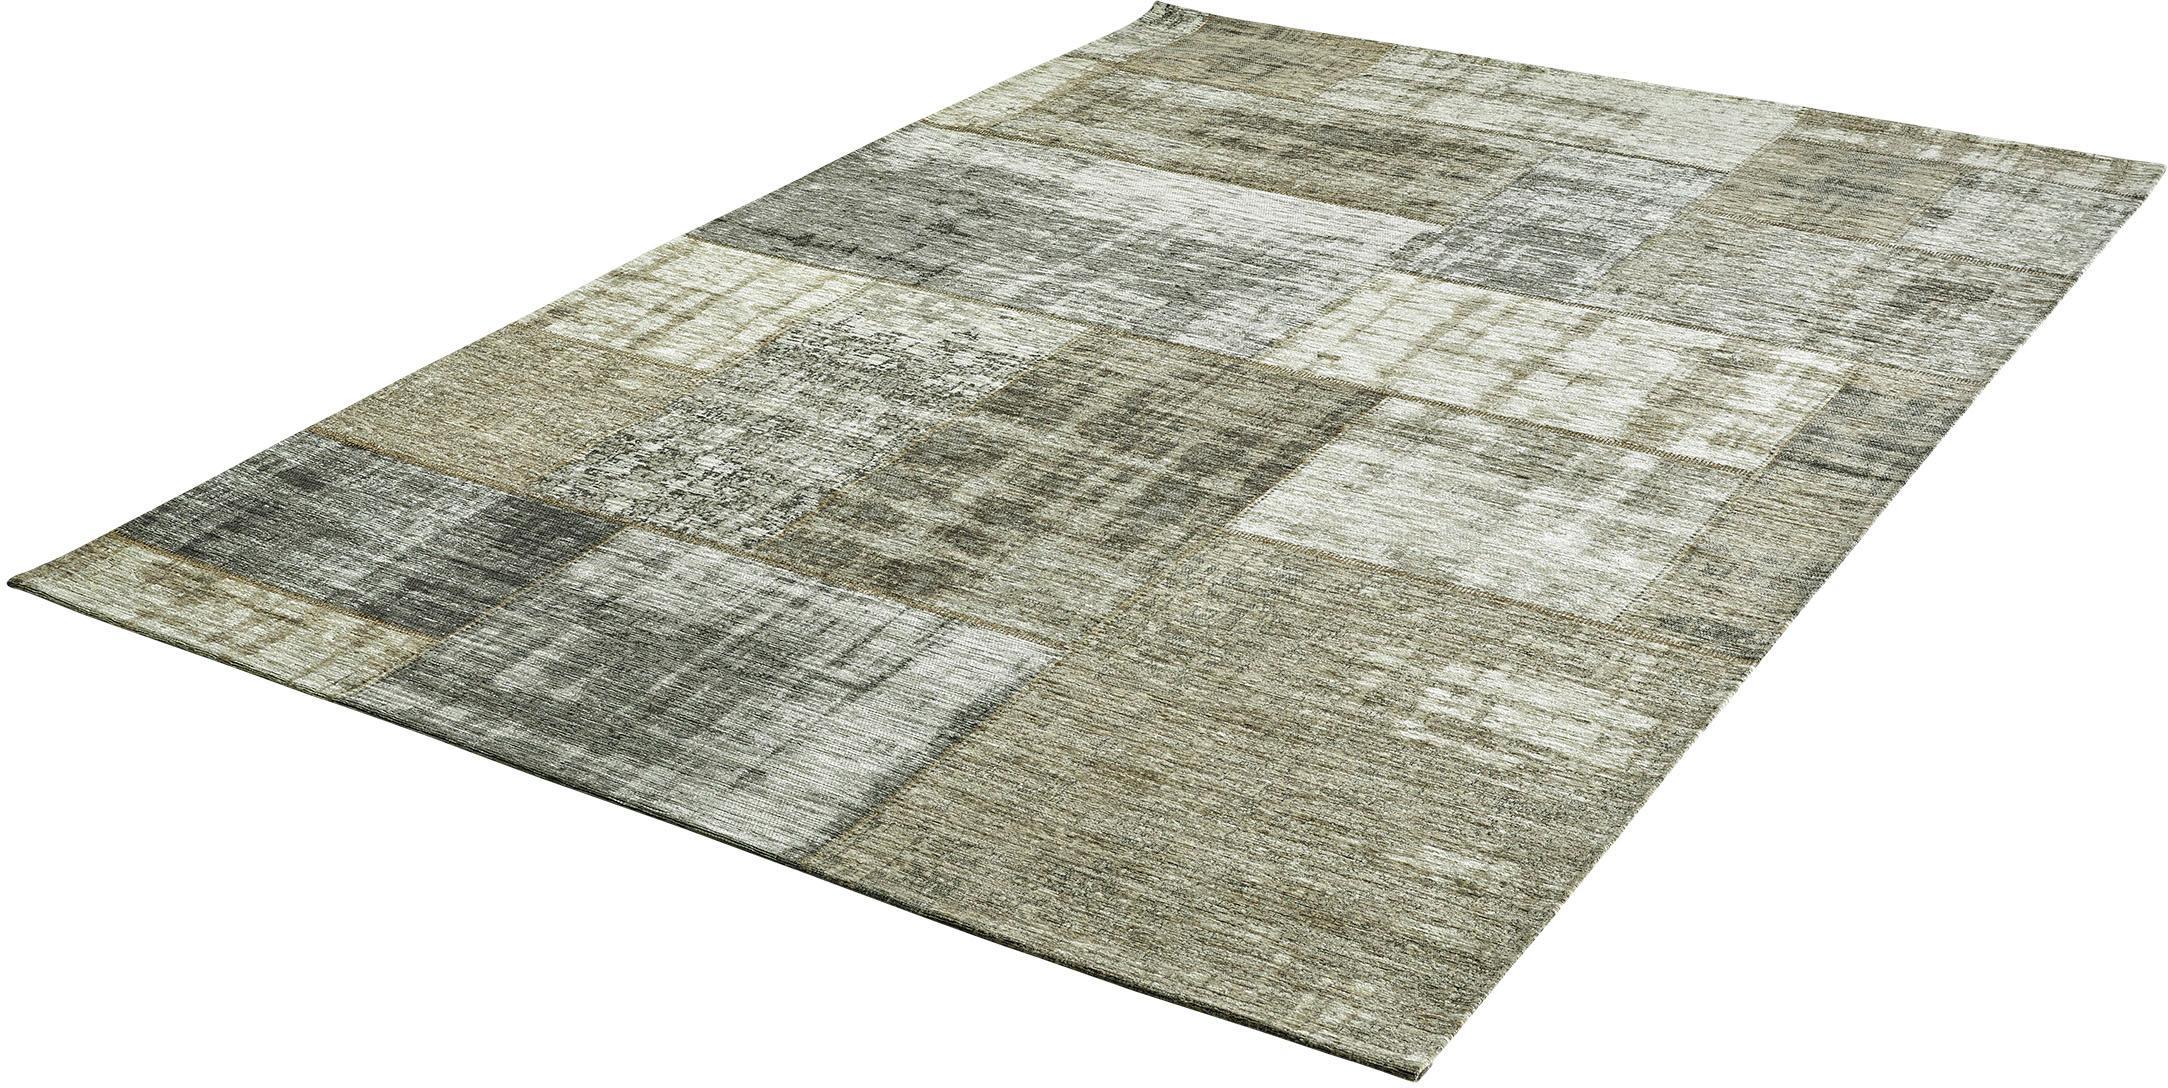 Teppich My Gent 751 Obsession rechteckig Höhe 10 mm maschinell gewebt